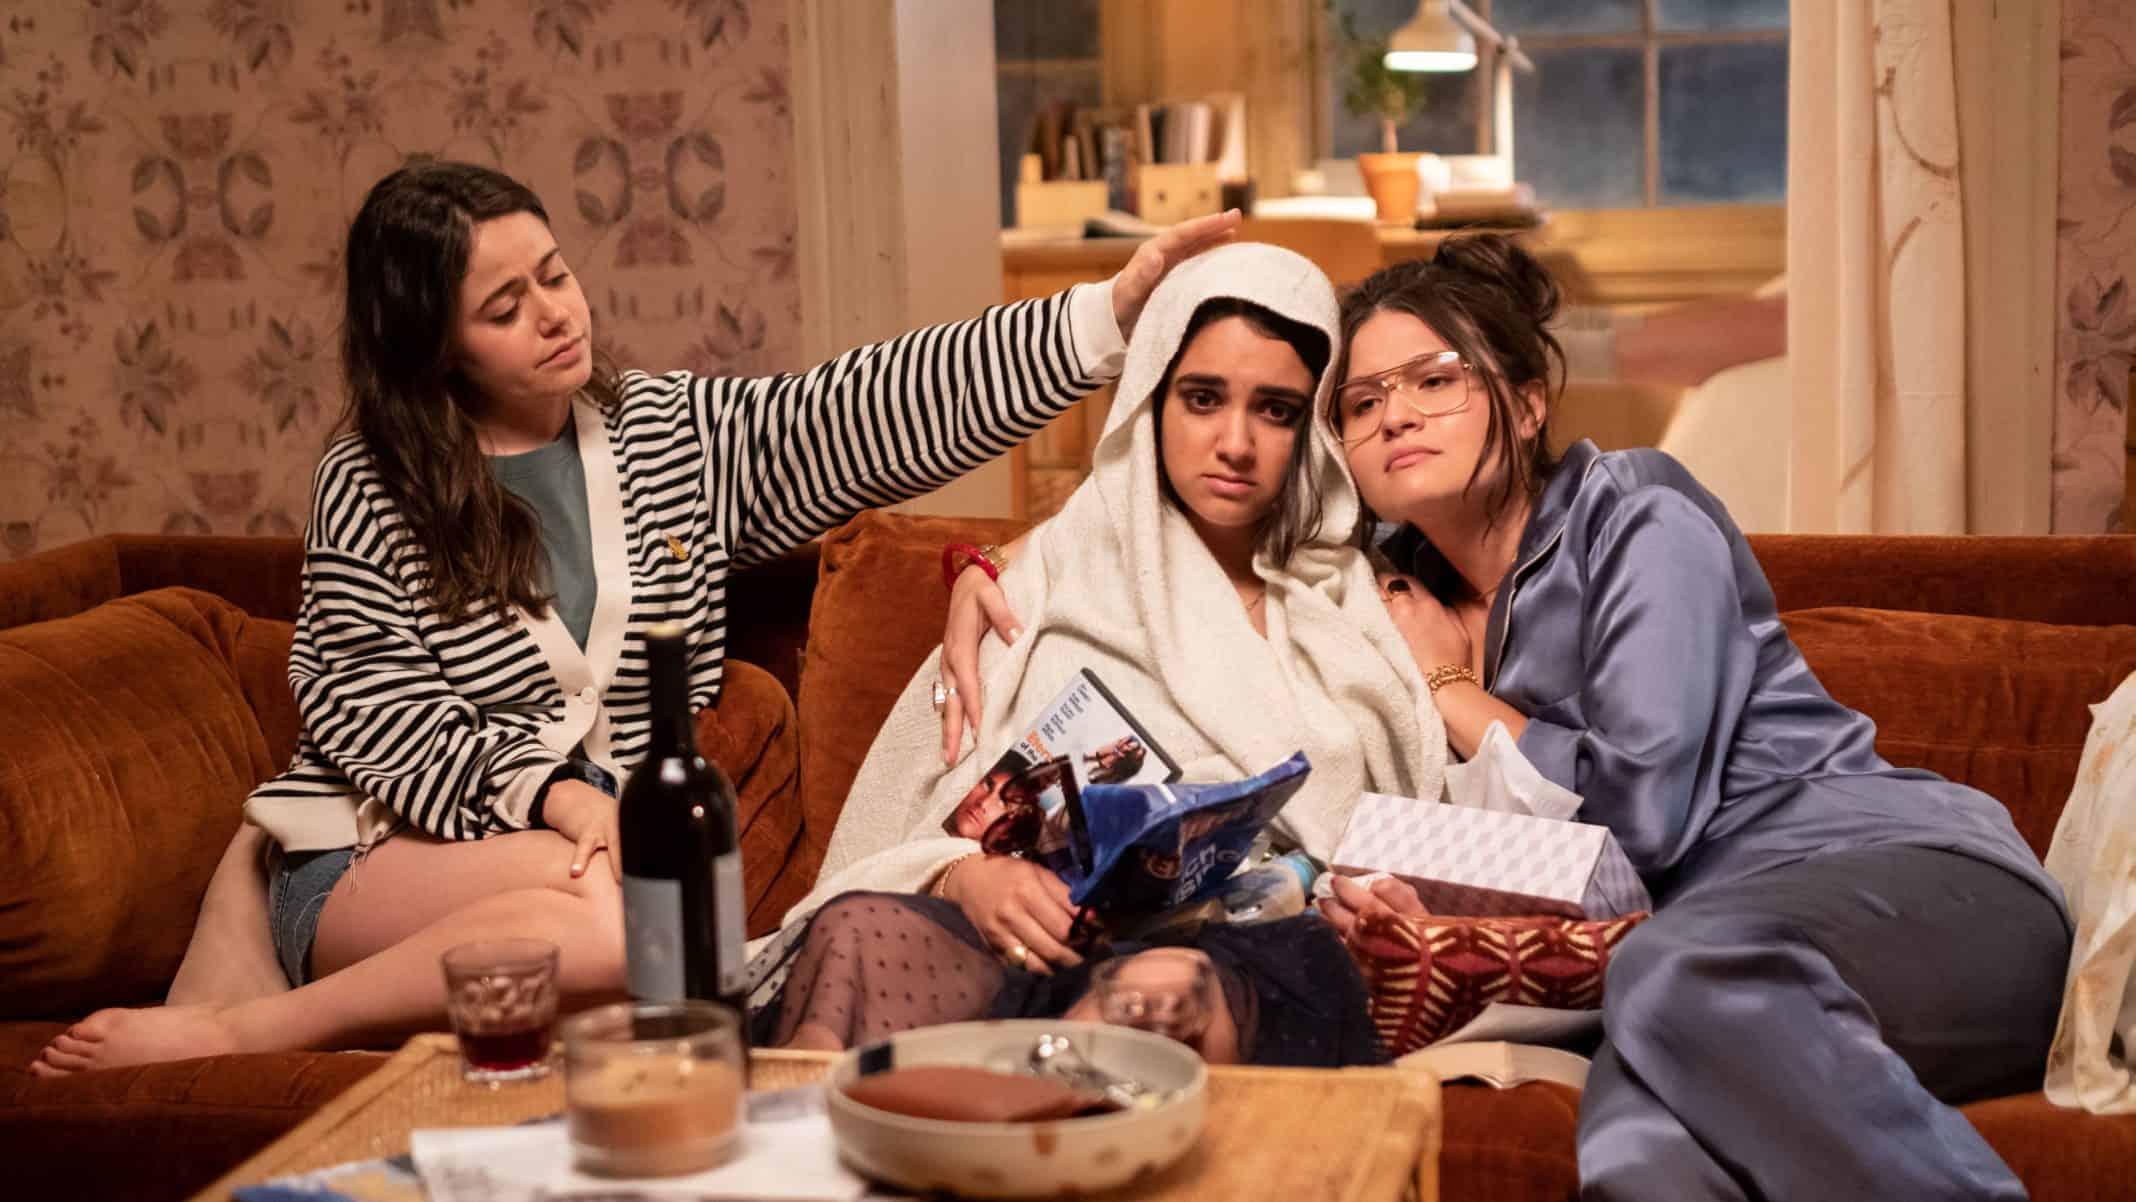 Amanda (Molly Gordon) and Nadine (Phillipa Soo) try to help Lucy (Geraldine Viswanathan, center) feel better